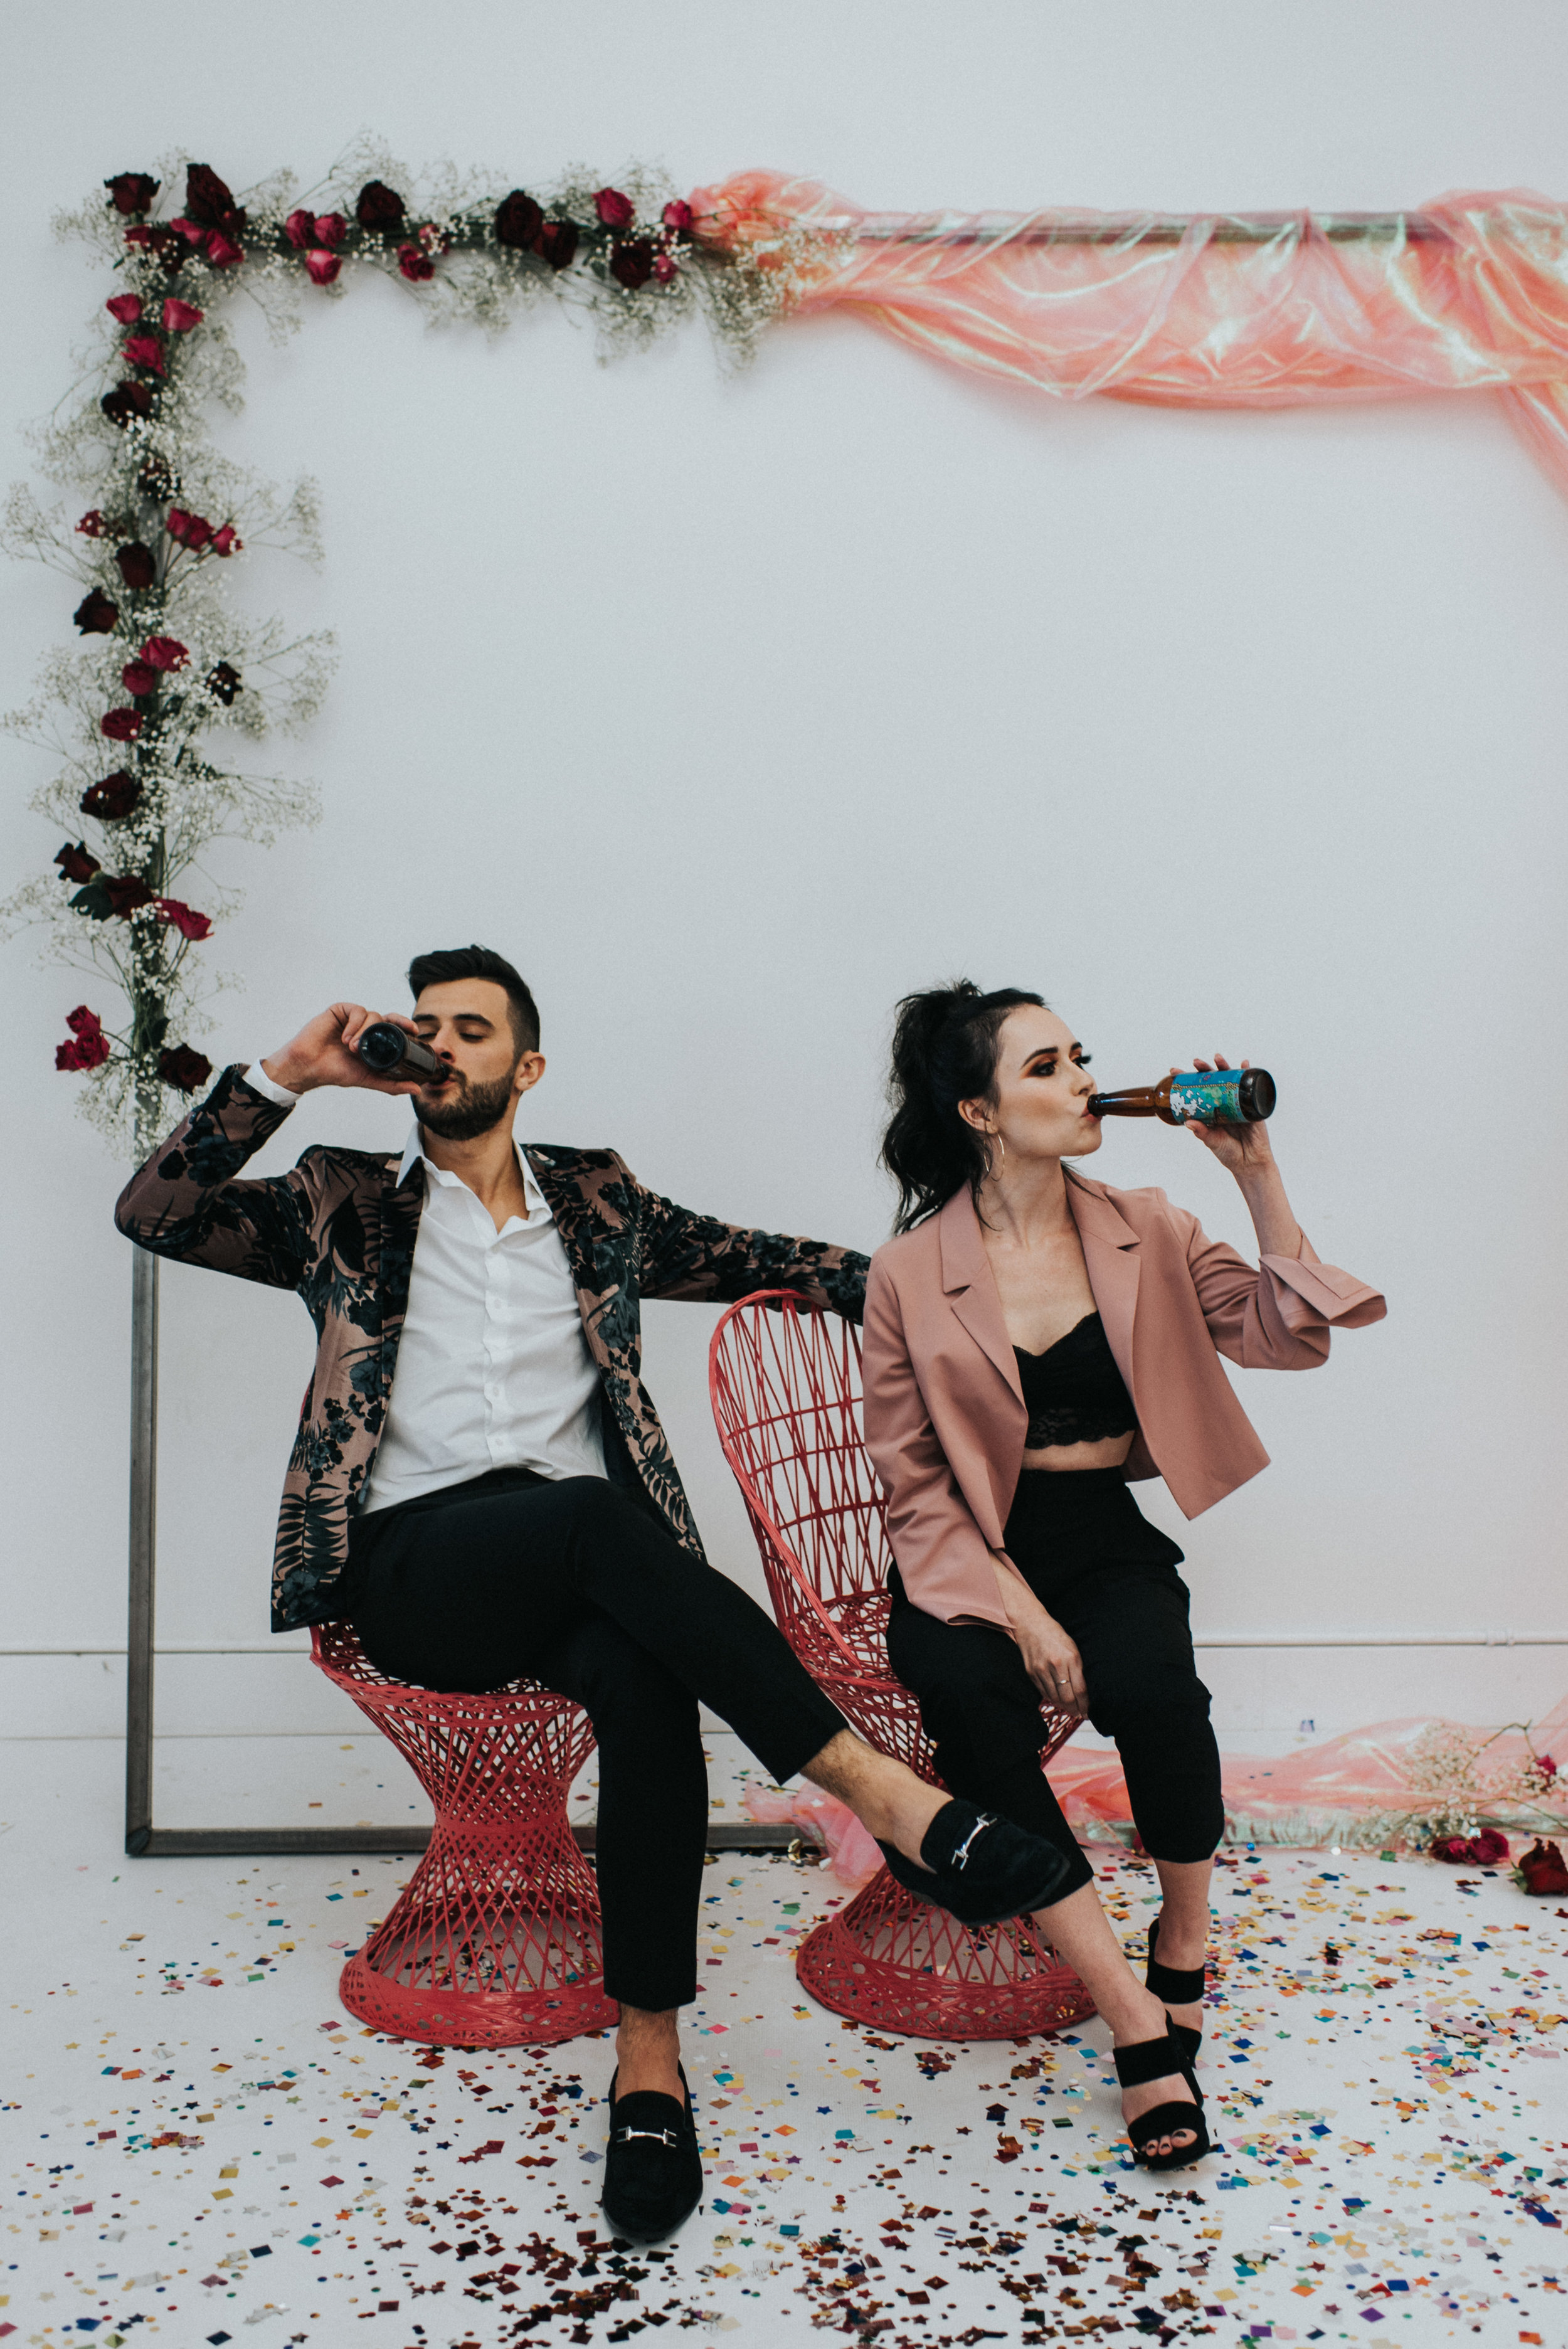 Millennial Pink Inspired Wedding - Groomslady